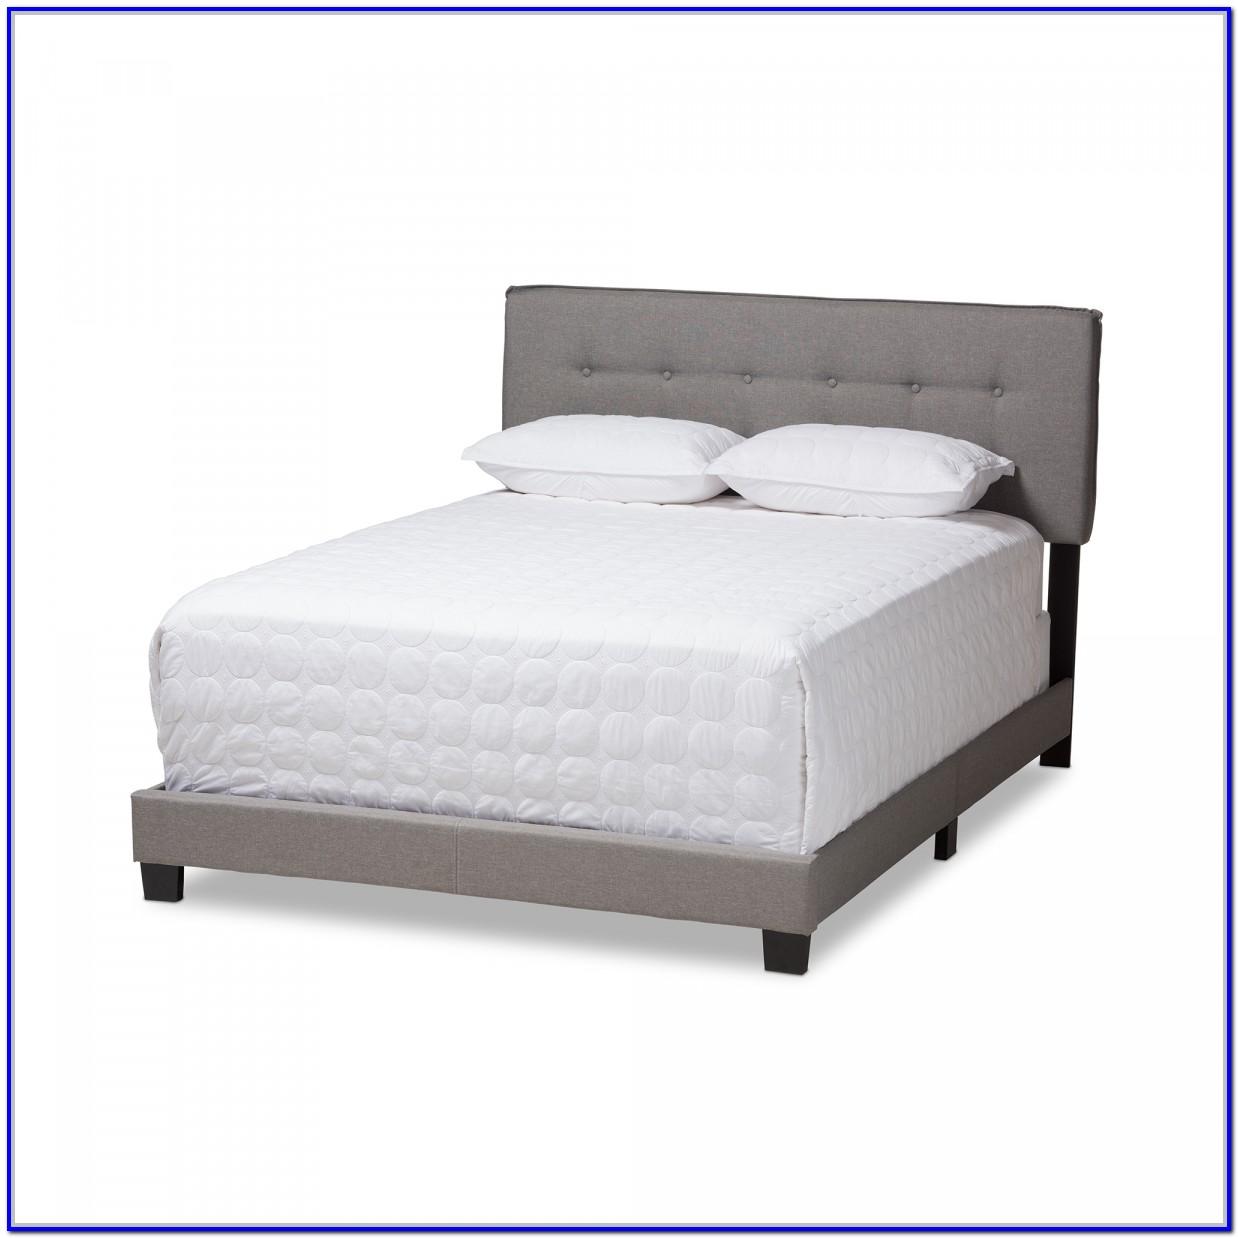 Light Grey Upholstered Queen Bed